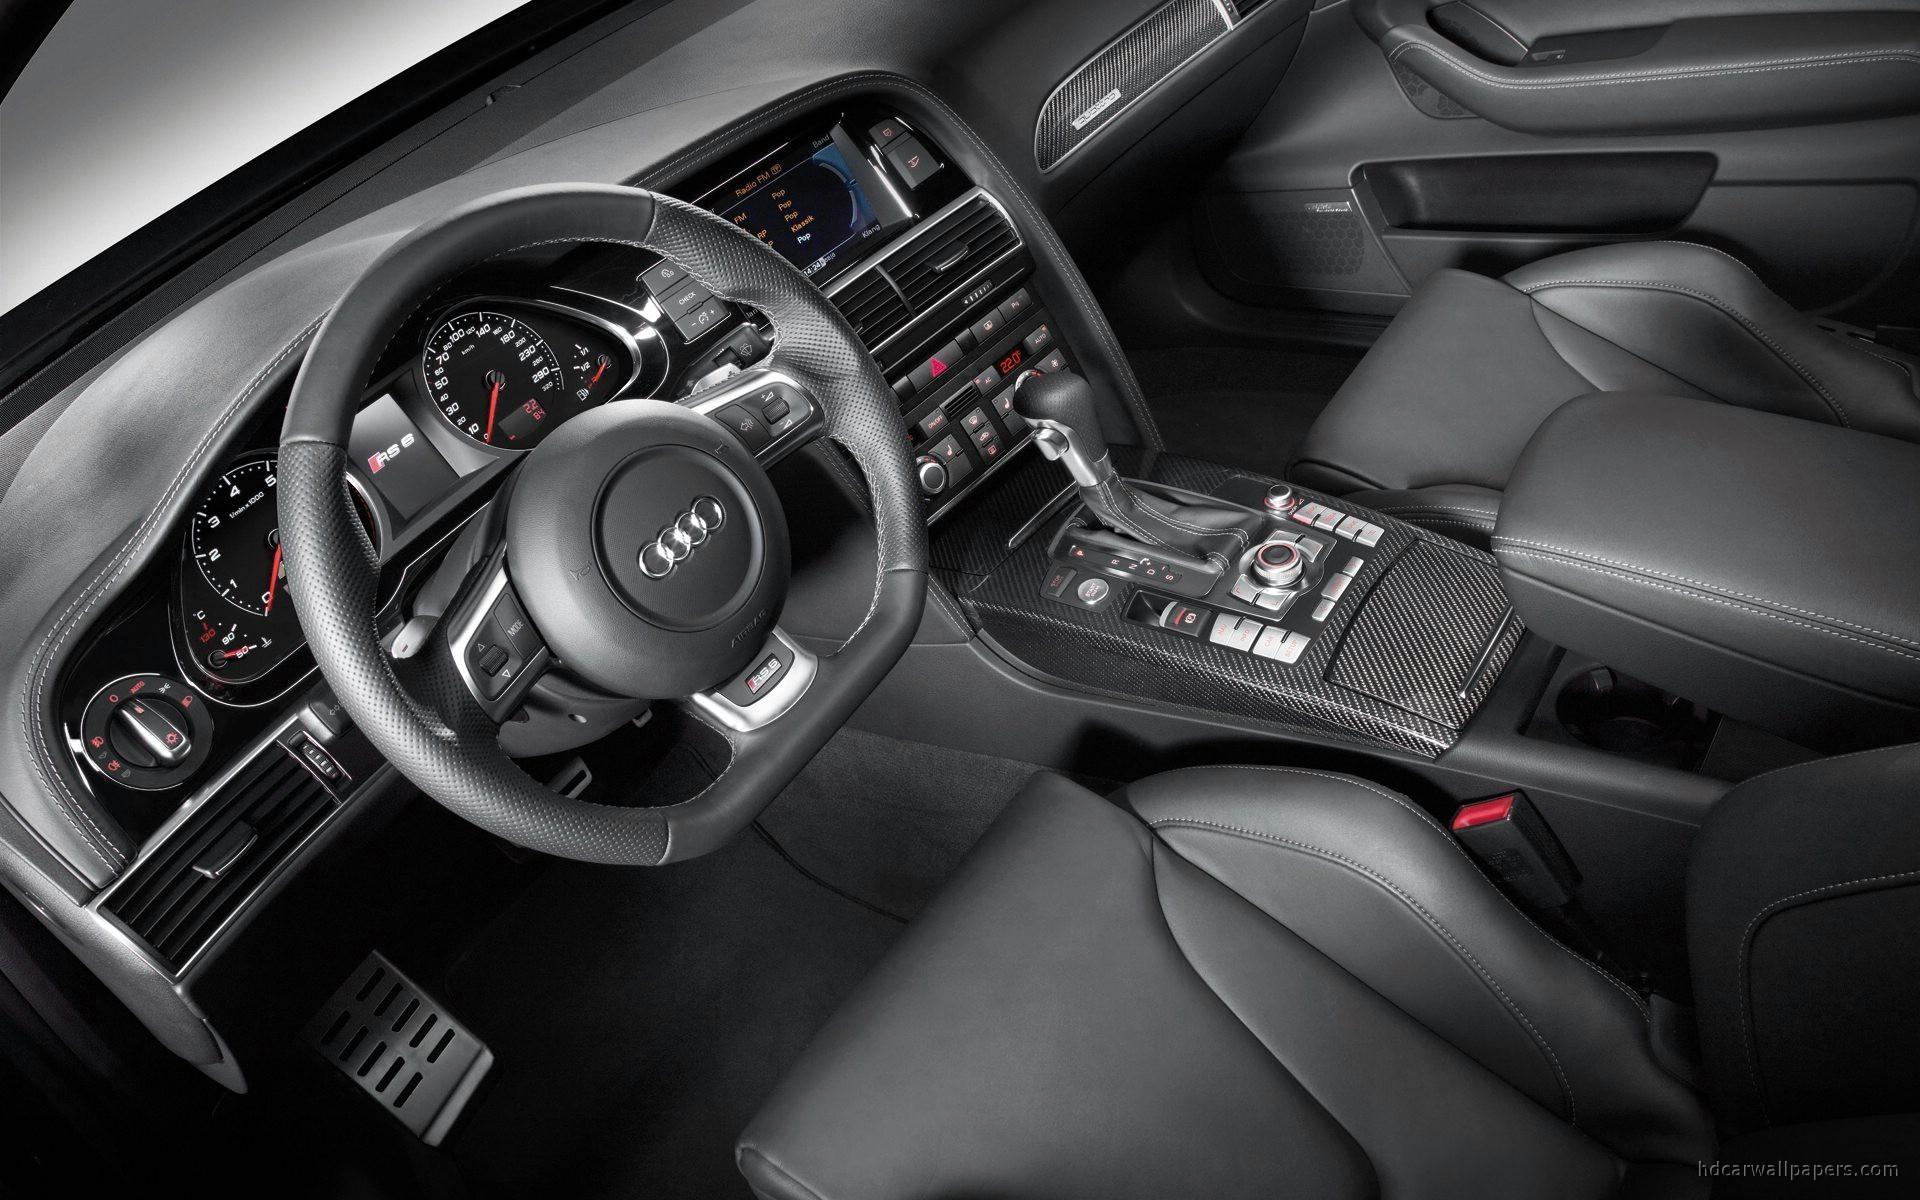 Audi Rs 6 2009 Interior 2 Wallpaper Hd Car Wallpapers